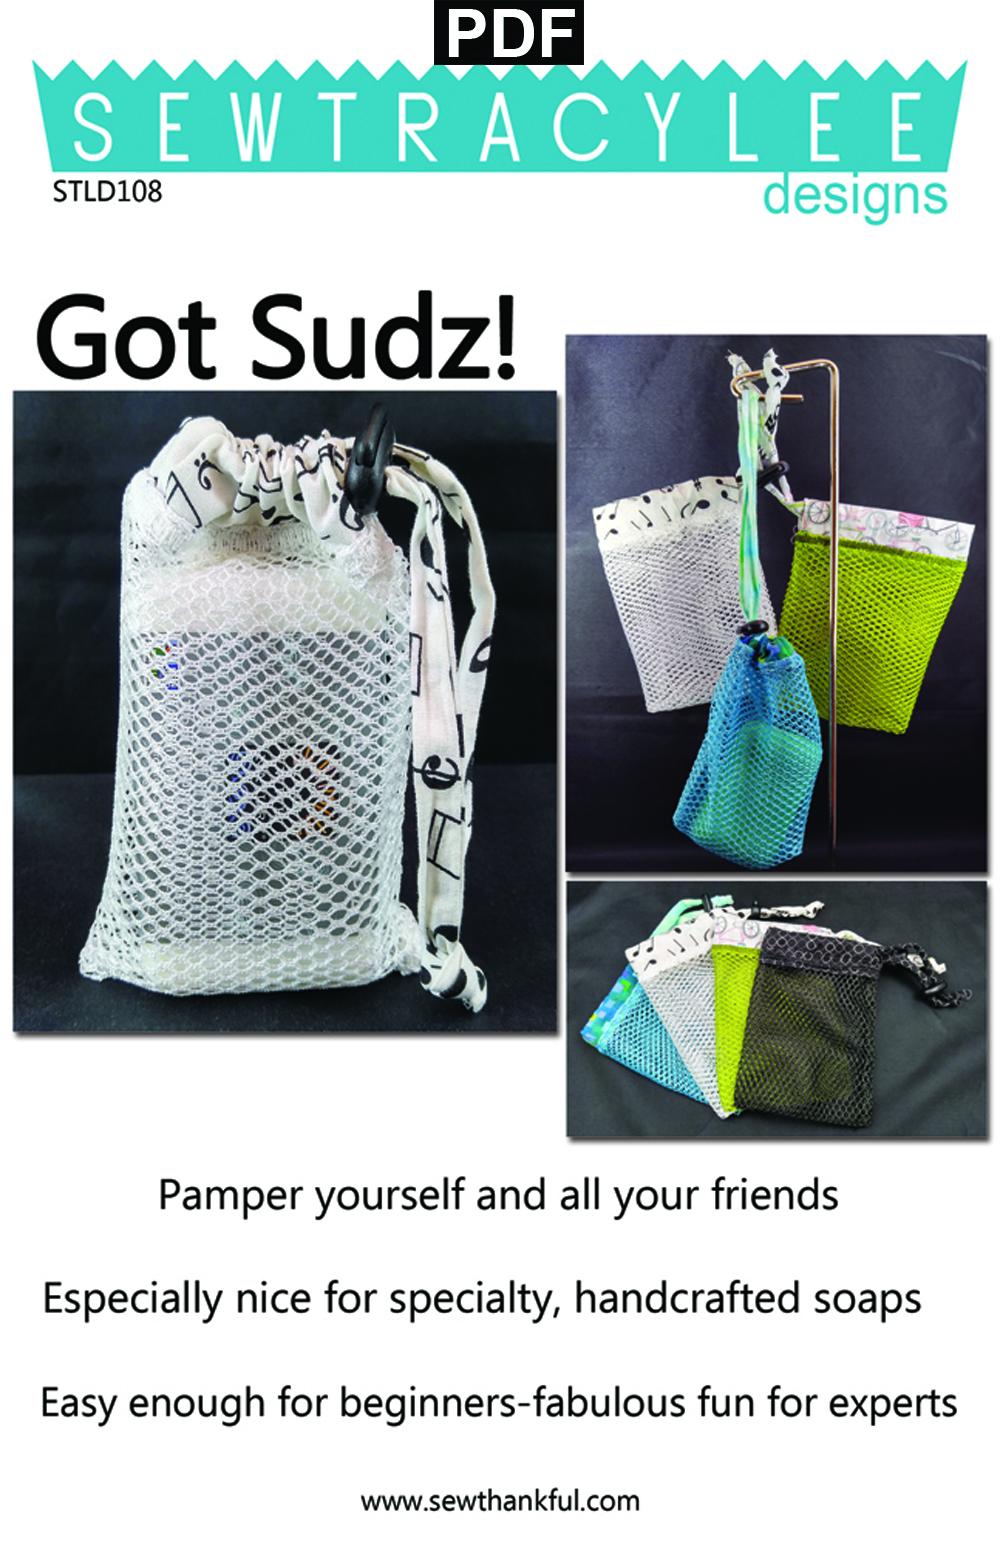 Got-Sudz-sewing-pattern-Sew-TracyLee-Designs-Front